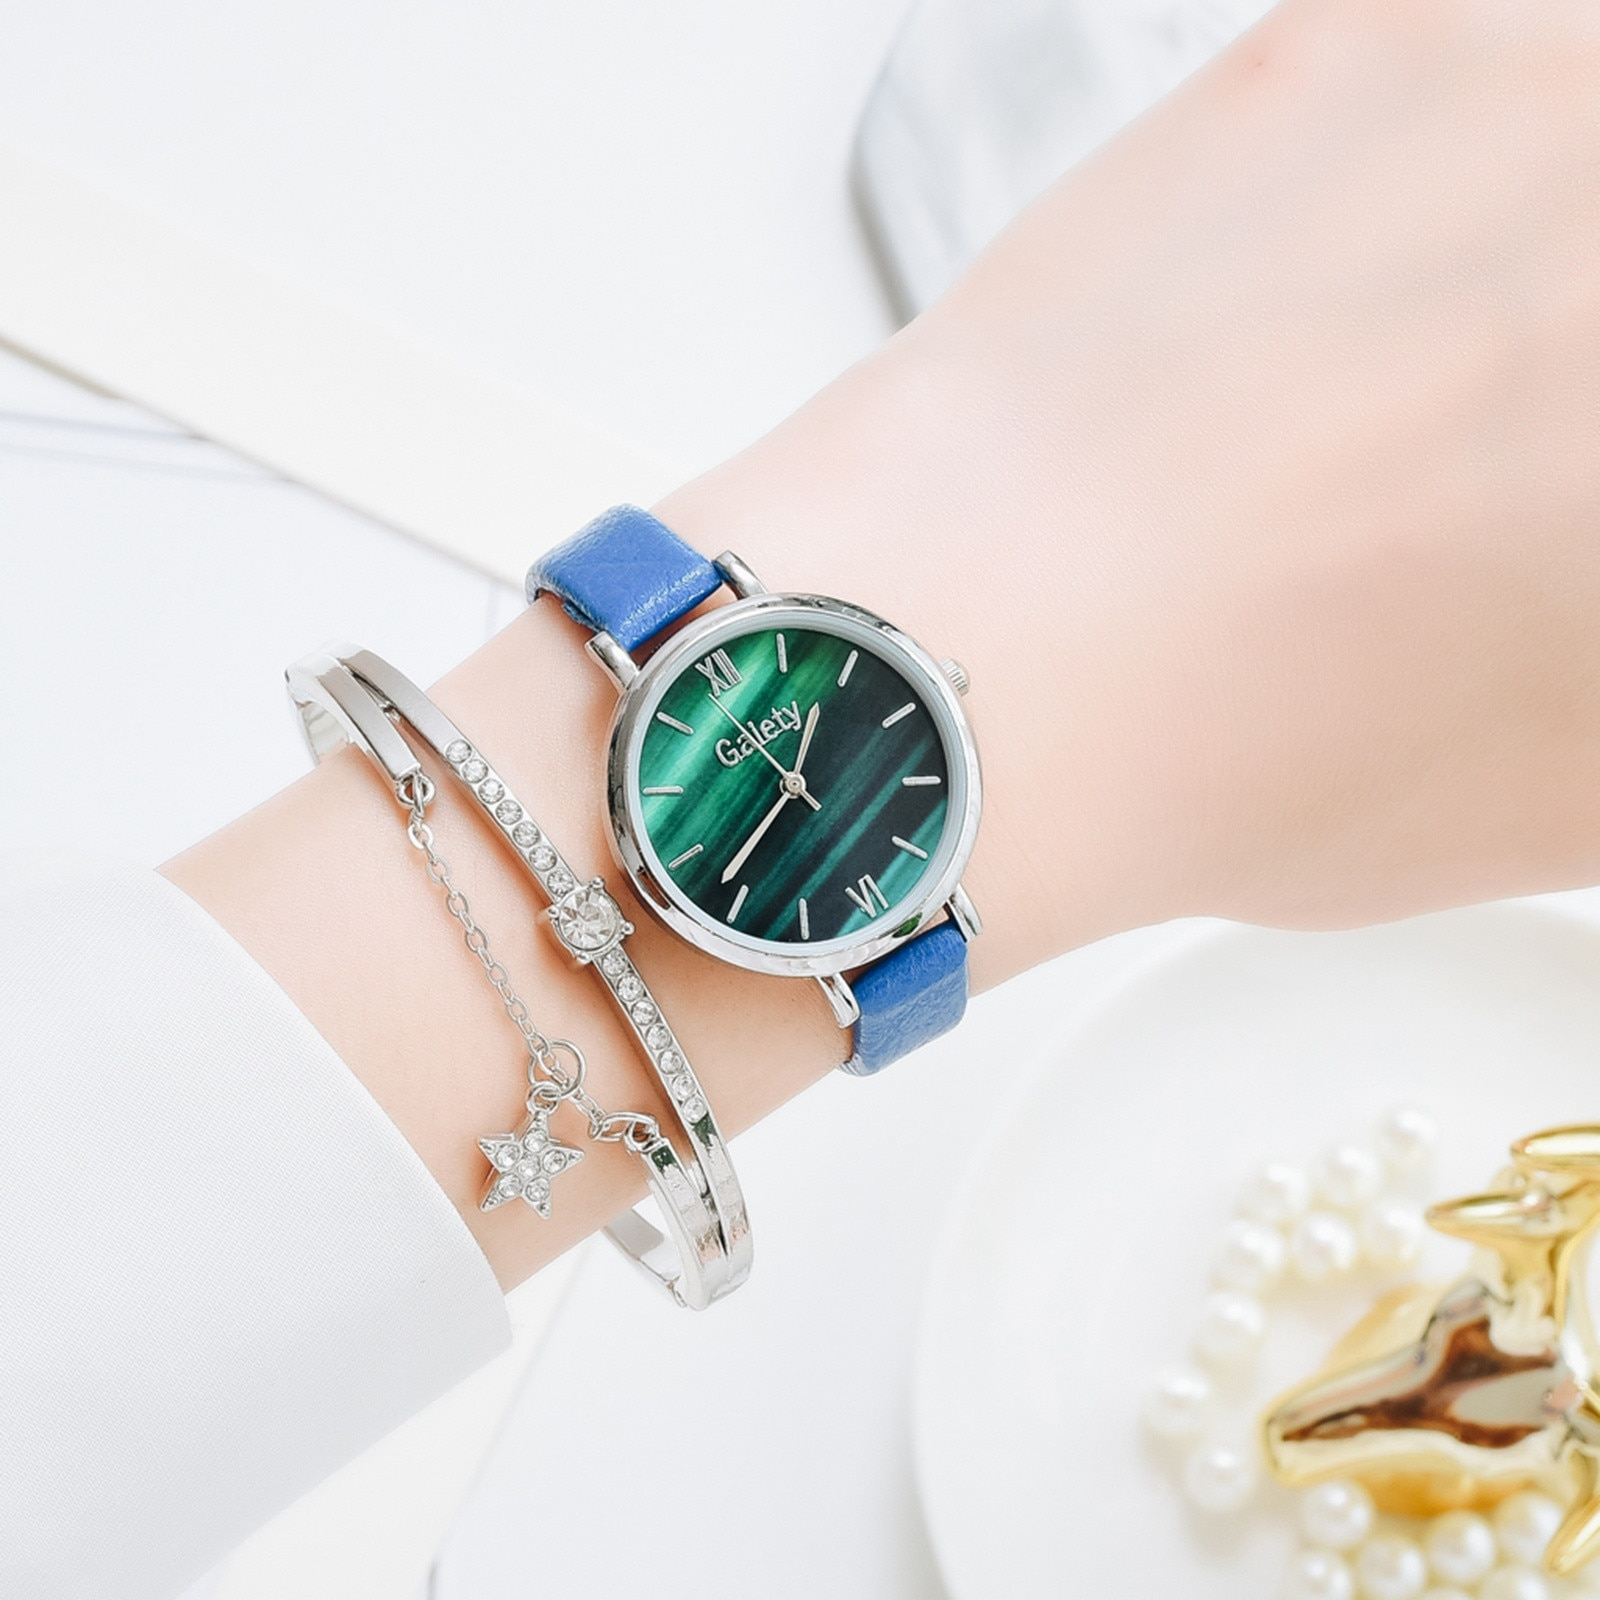 Brand Luxury Watch For Women Fashion Romantic Bracelet Watch Ladies Dress Watches New Simple Dress G